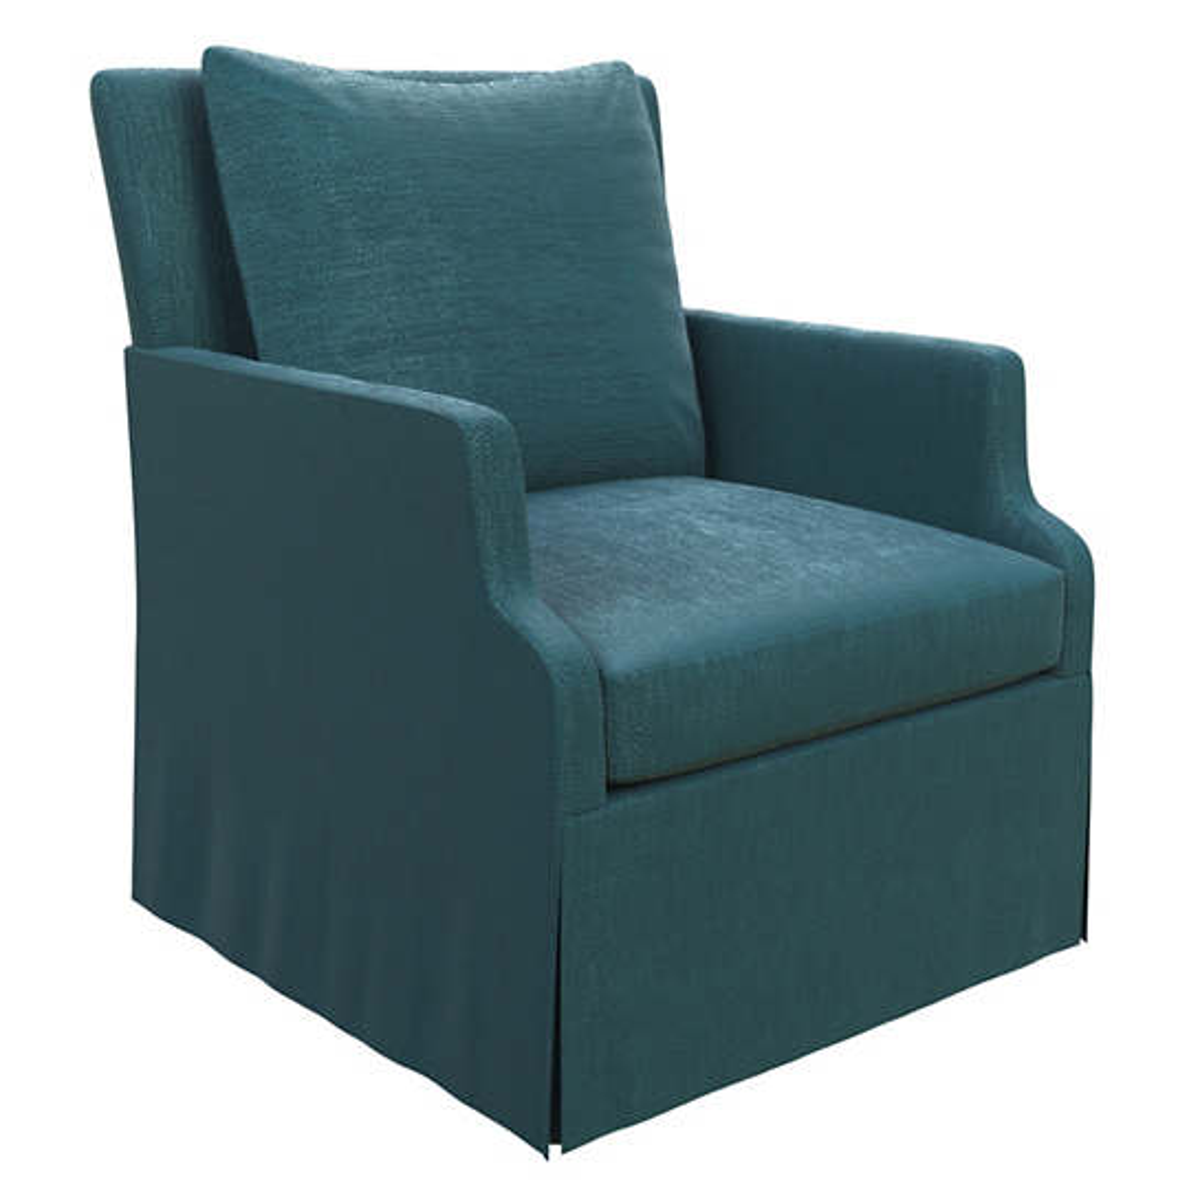 Plush Velvet Sapphire Aix Chair